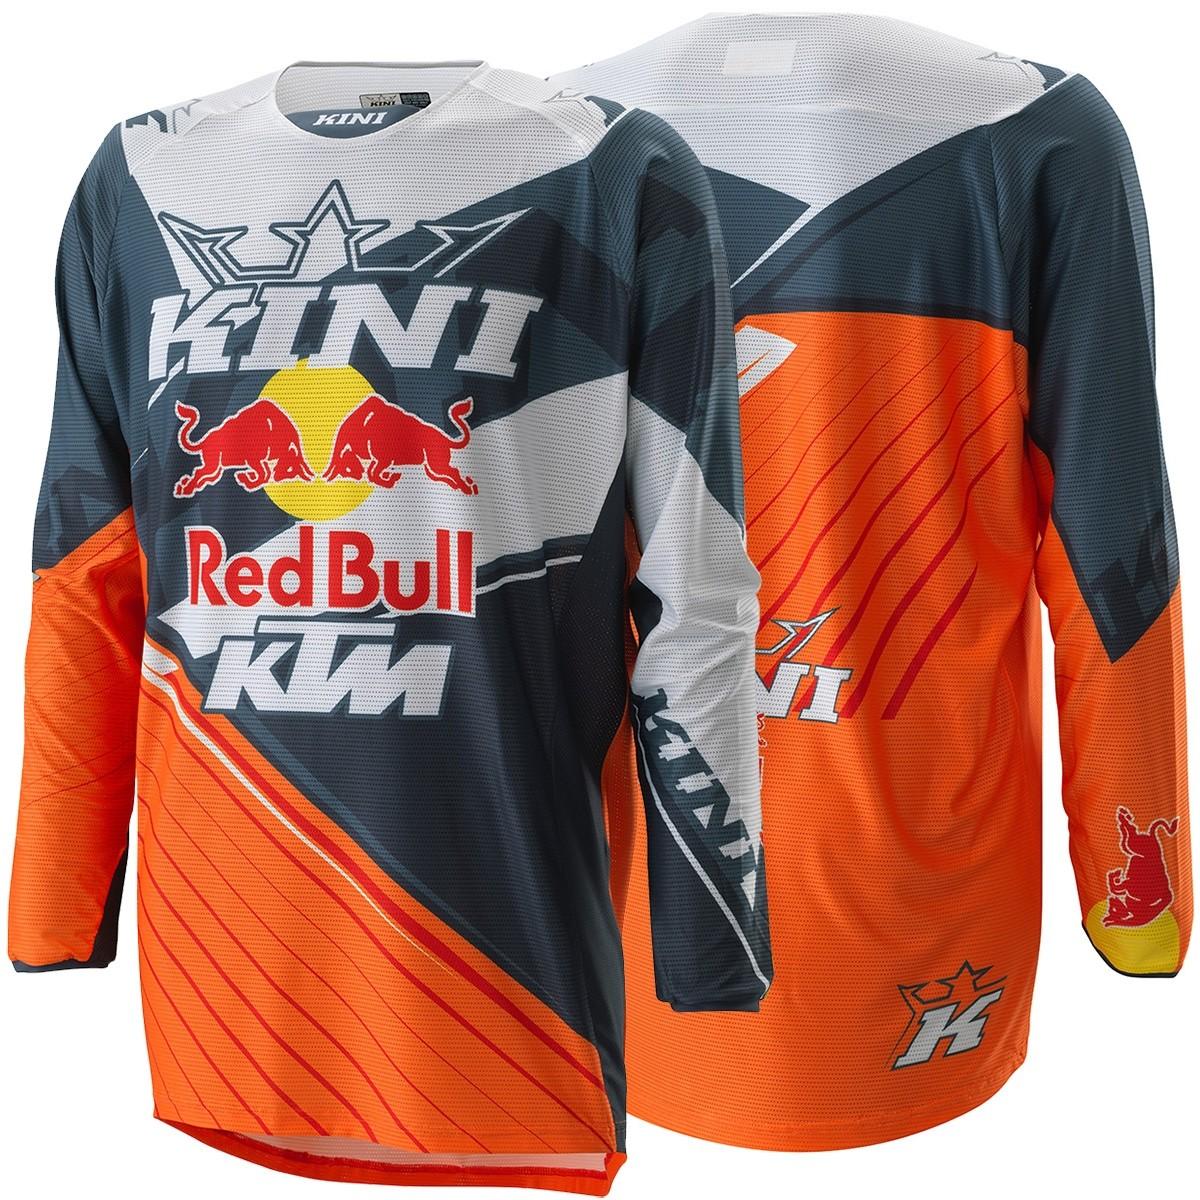 Camiseta Ktm Kini Red Bull Competition Shirt 2021